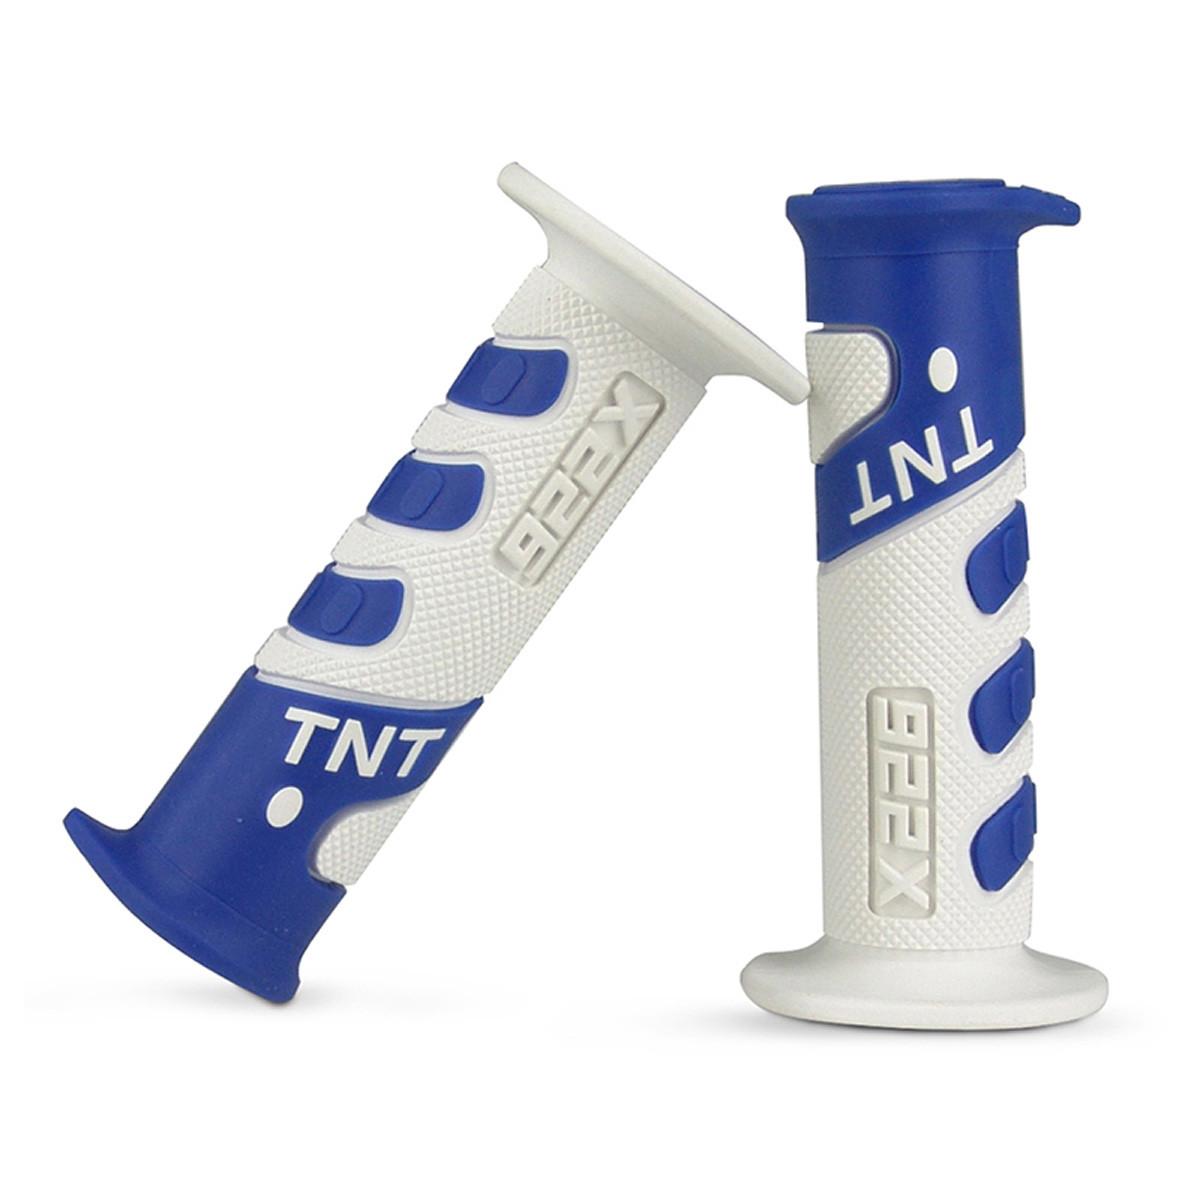 Poignées de Guidon - TNT 922X Blanc / Bleu